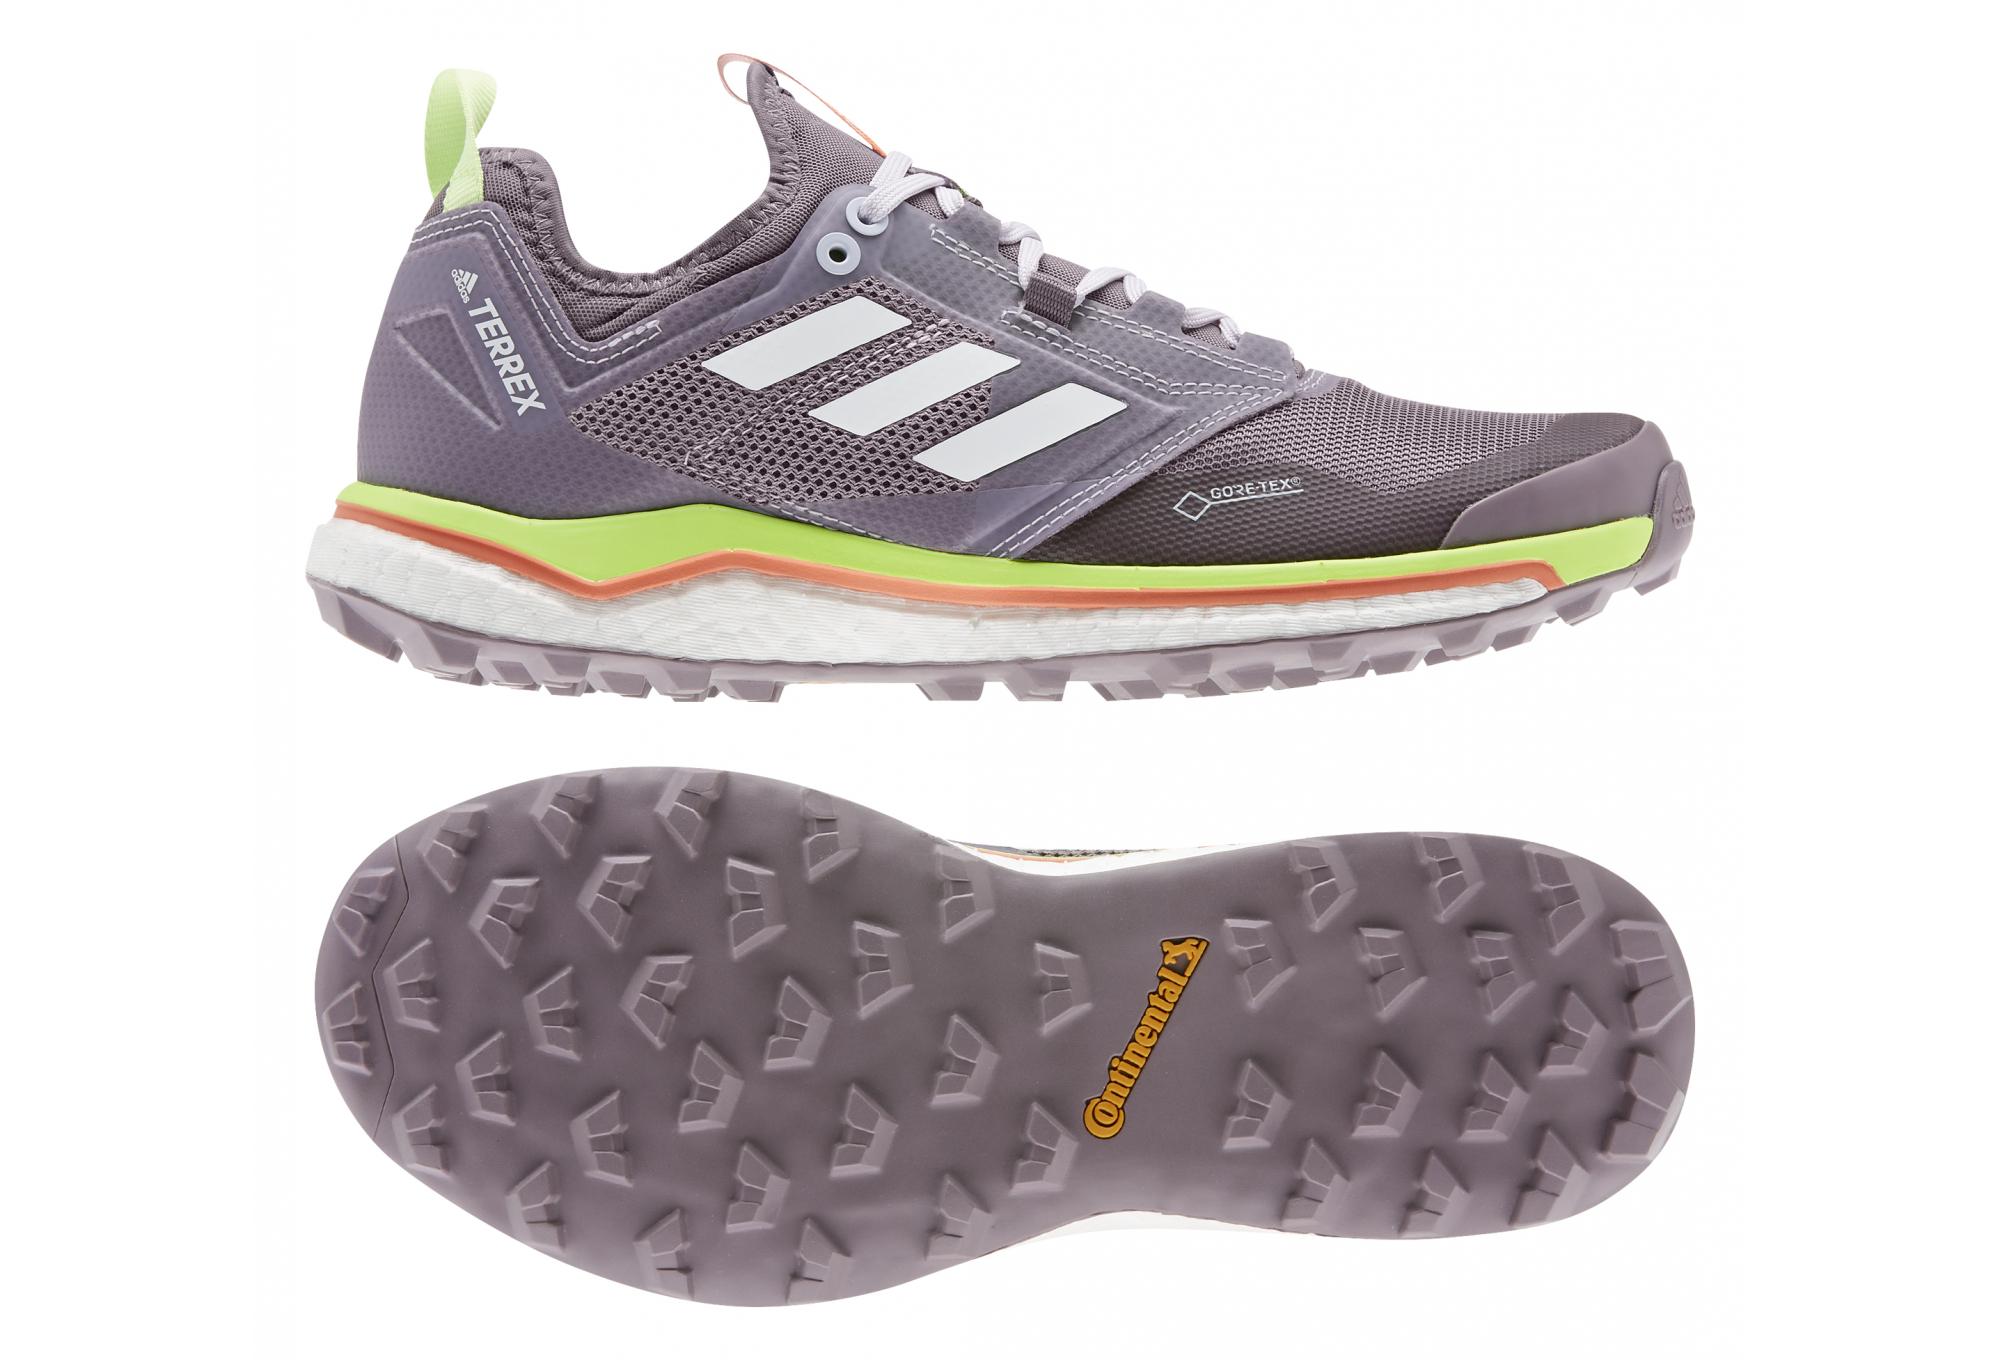 Chaussures femme adidas Terrex Agravic XT Gore-Tex | Alltricks.fr